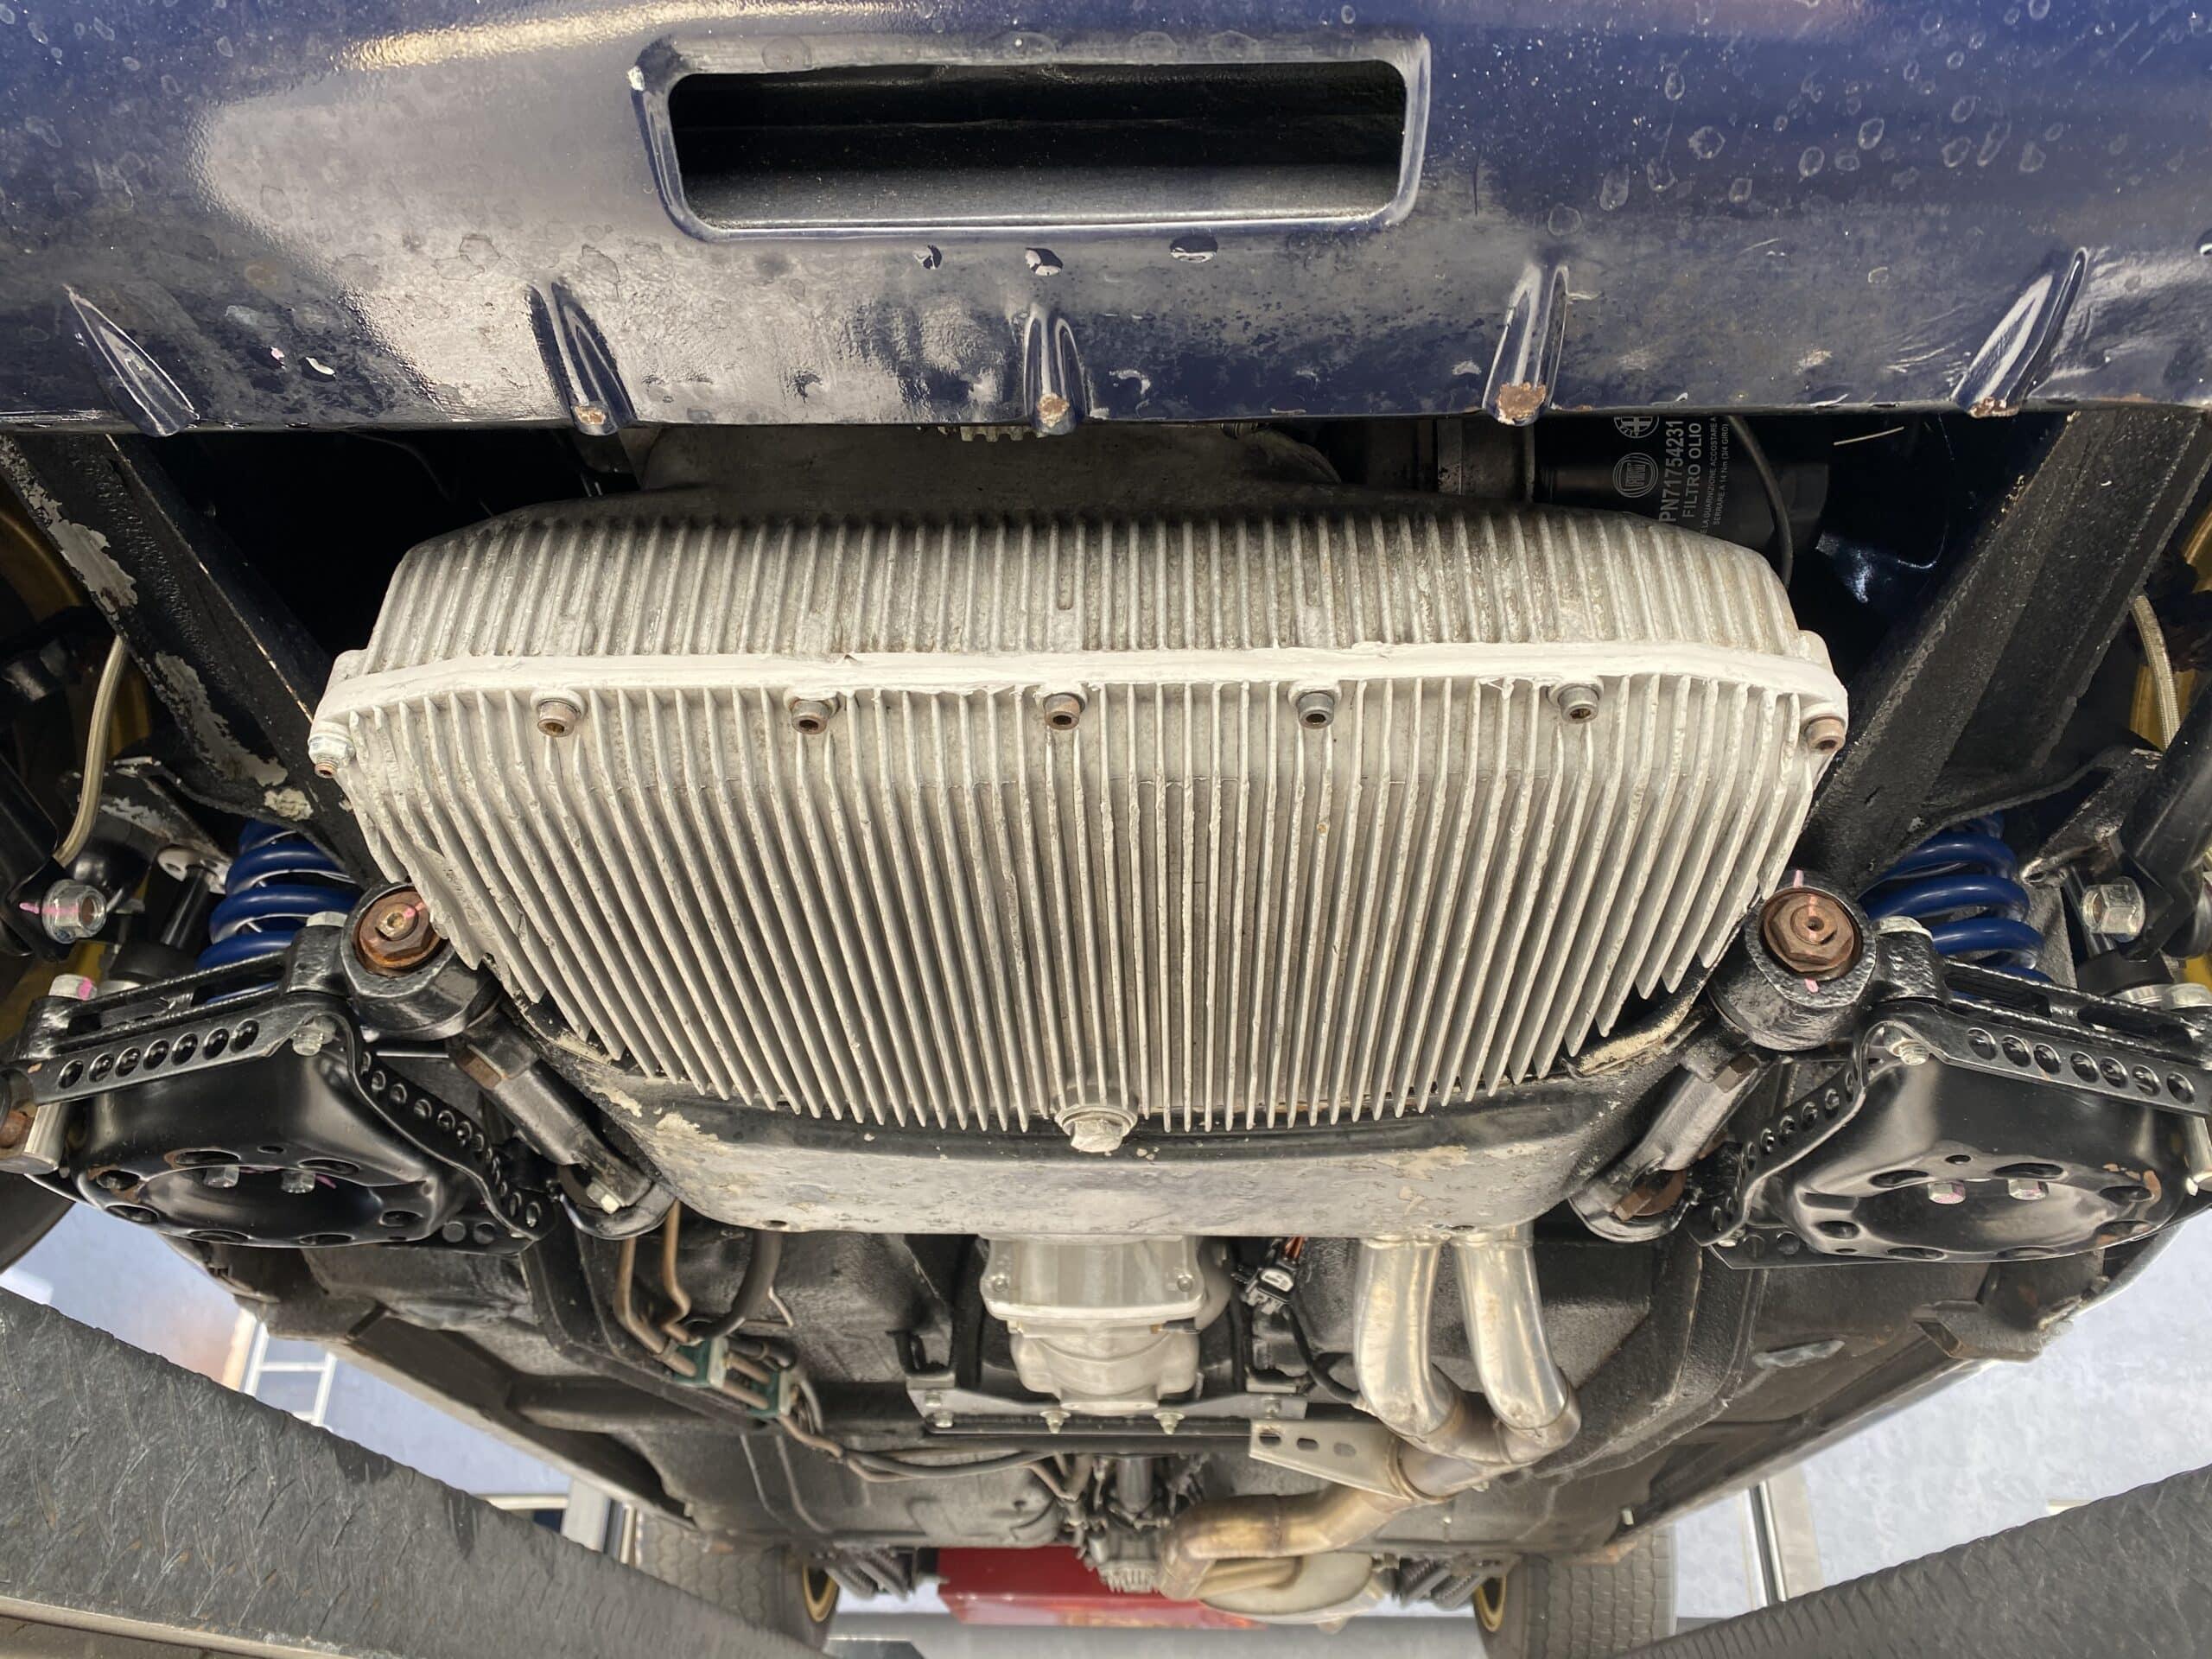 1971 Alfa Romeo GTV GTAM Tribute Alfaholics Built 2.0L Twin Plug Quaife Sequential trans- GTAM Brakes/ Suspension